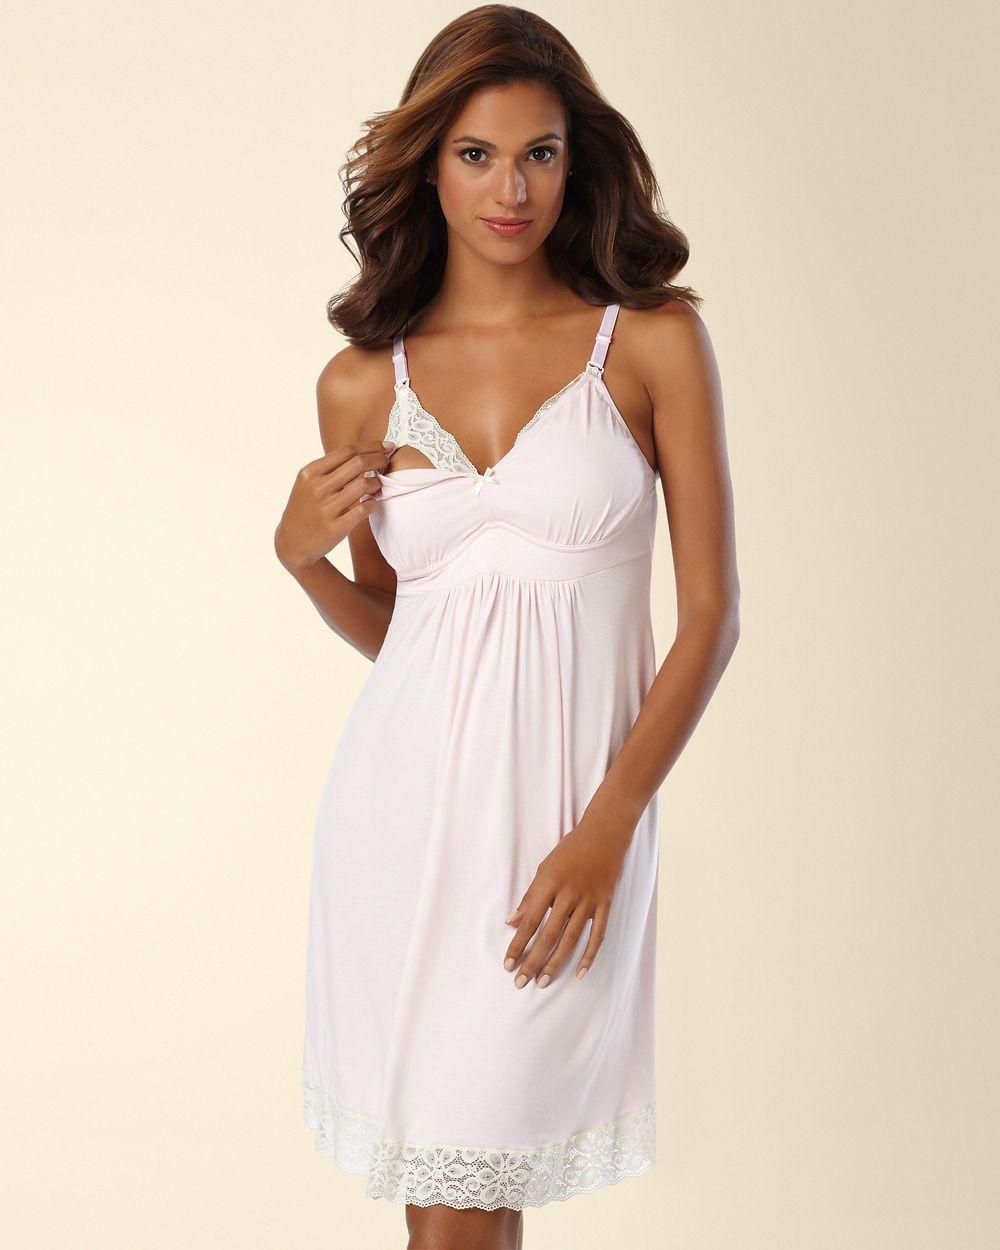 396ab19b95bfd Belabumbum Nursing Sleep Chemise With Contrast Lace #Sleep#Nursing# Belabumbum | Chemises Nightgown | Chemise, Nursing robe, Night gown